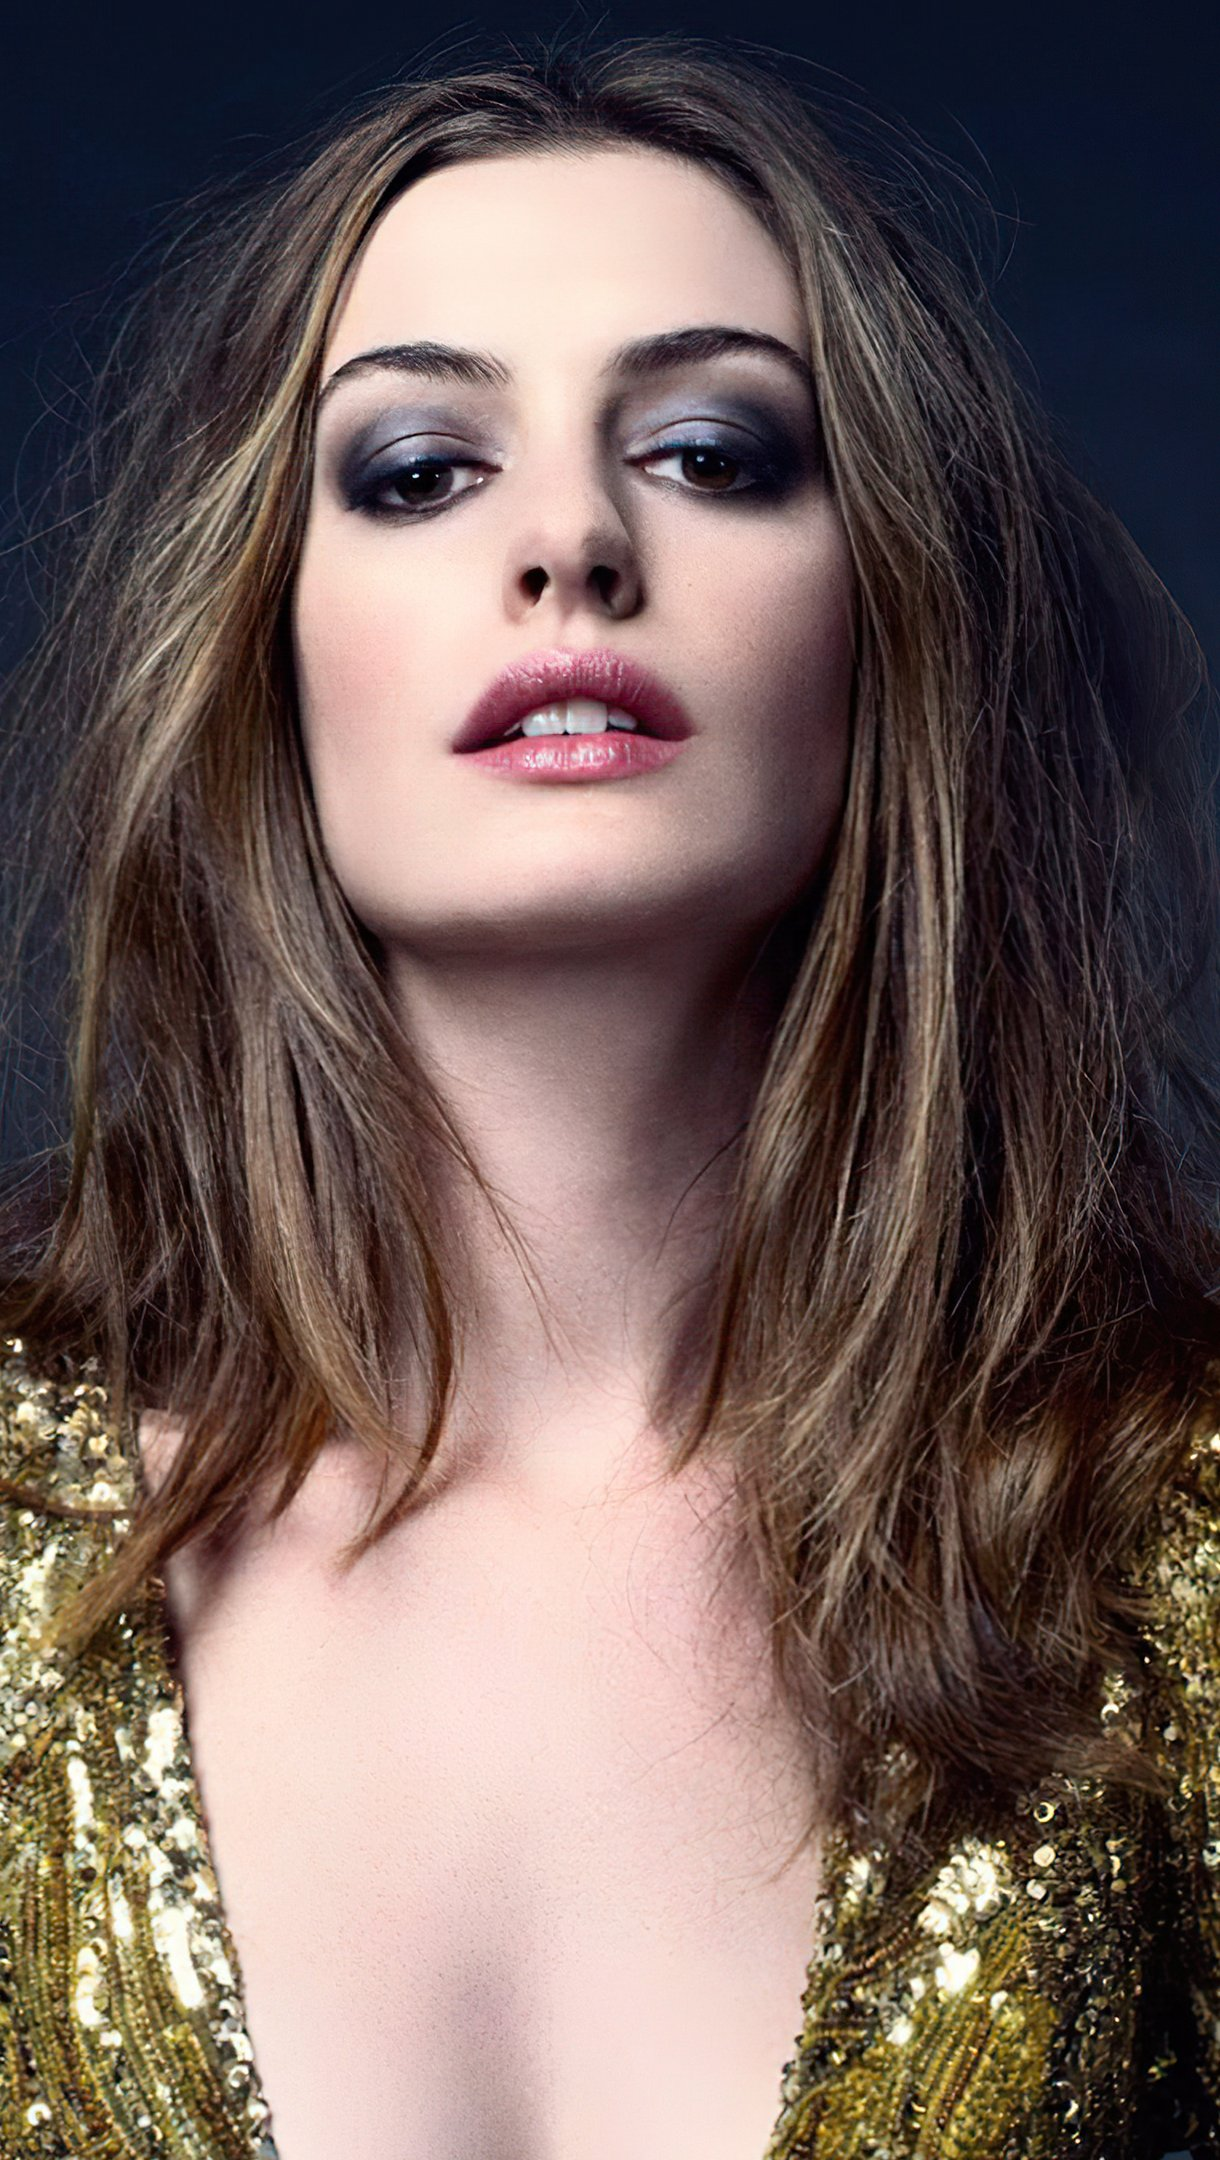 Wallpaper Anne Hathaway Elle Photoshoot Vertical